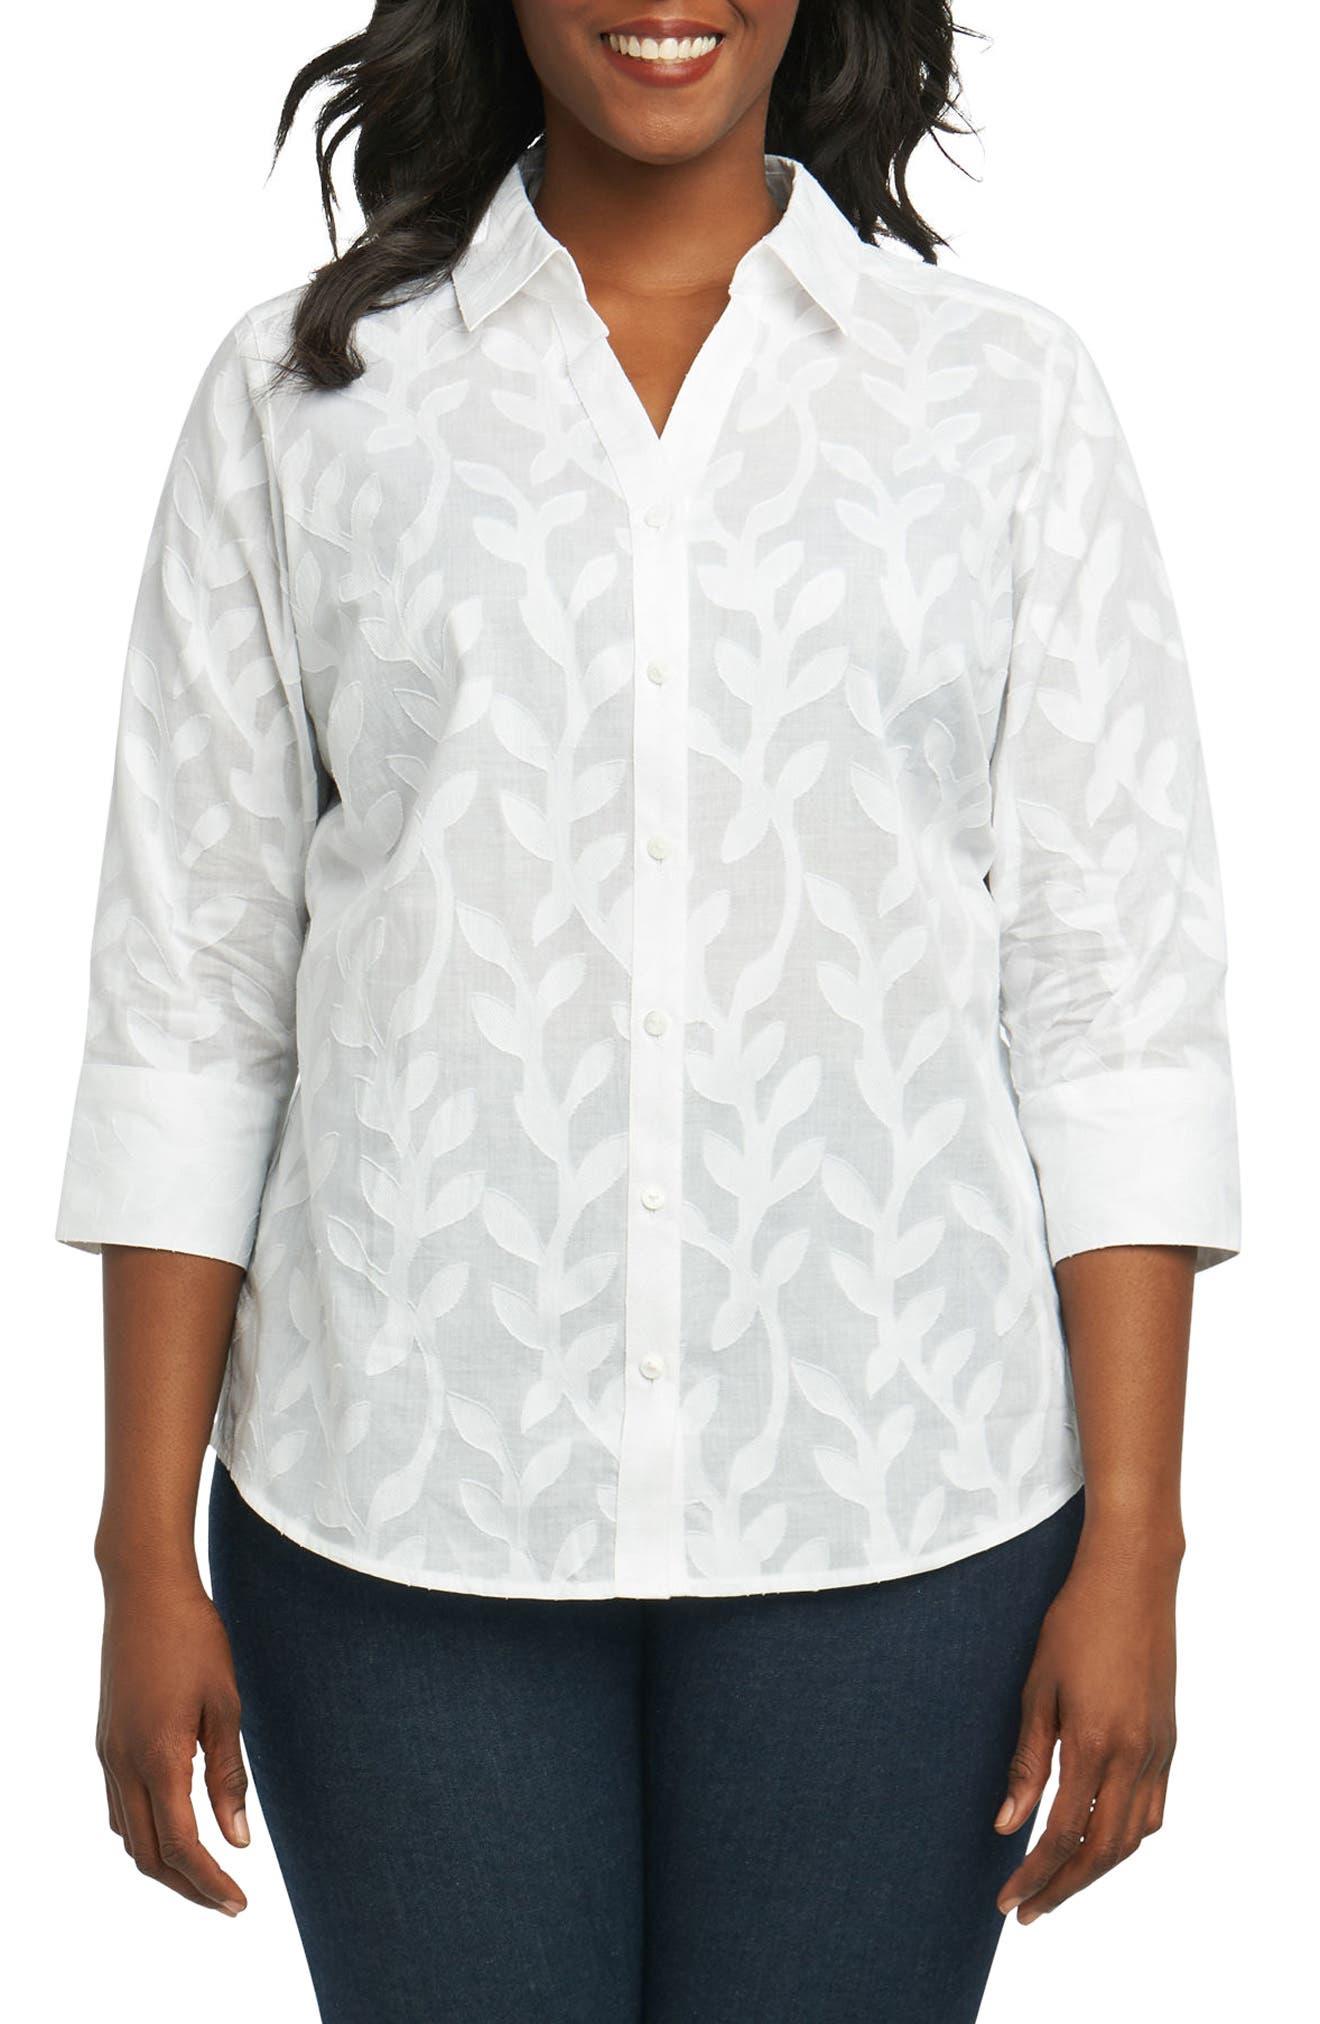 Mary Palm Jacquard Shirt,                         Main,                         color,